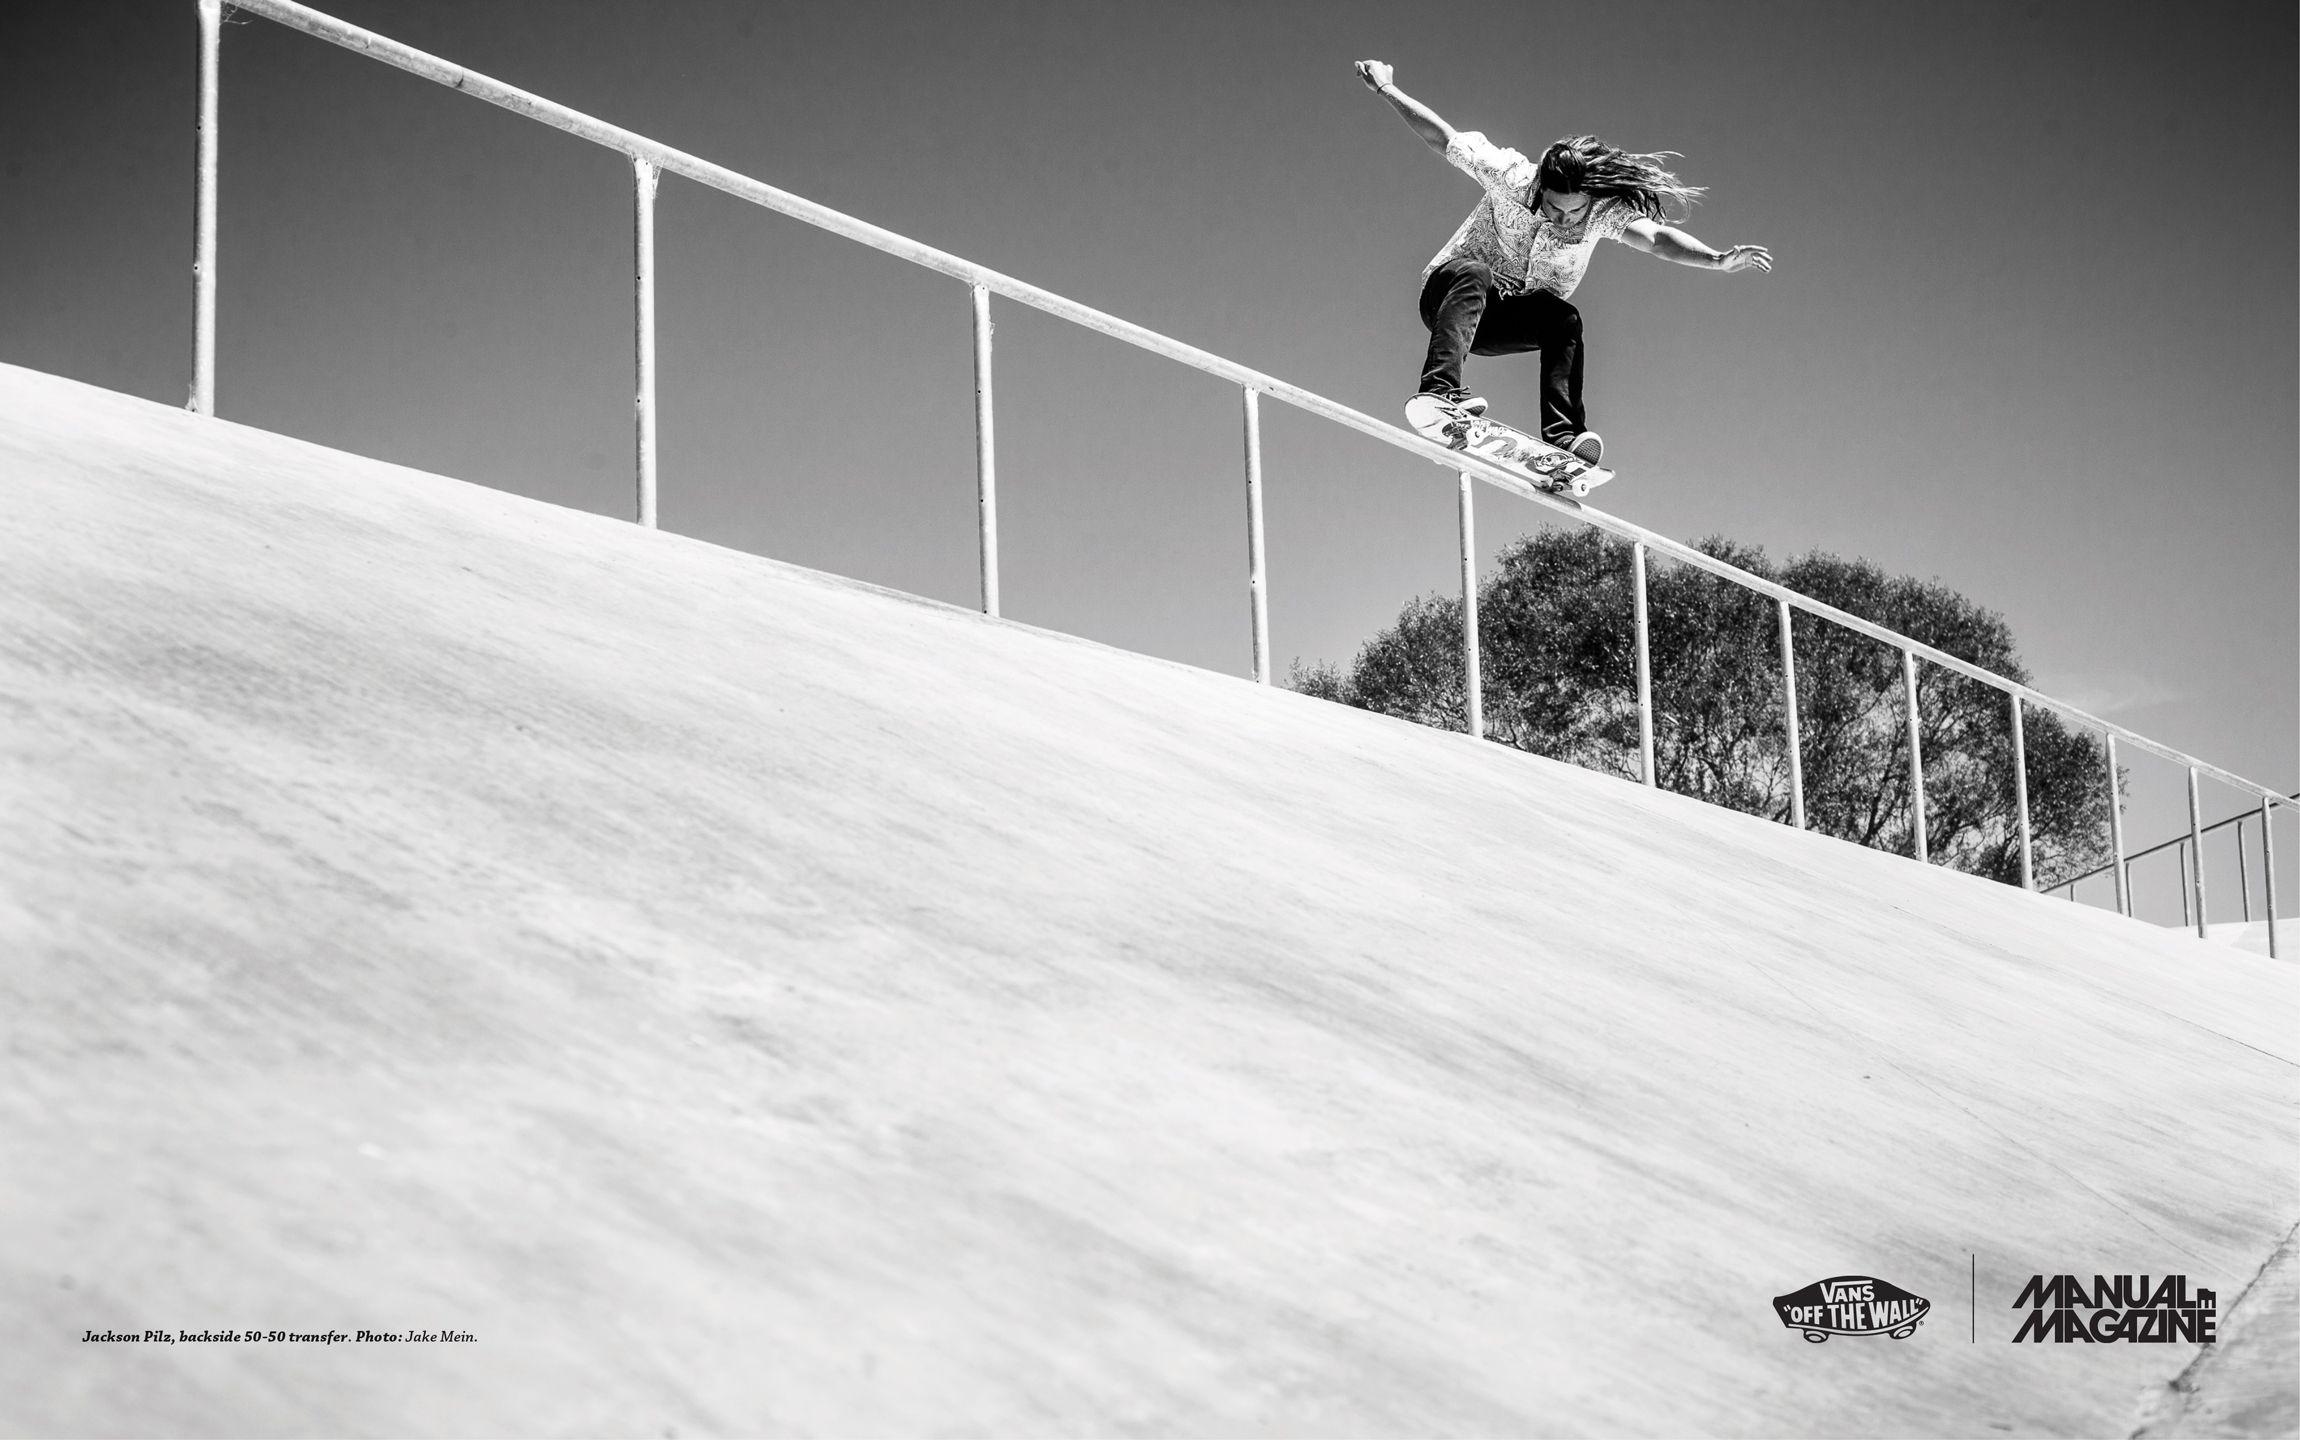 Free Vans Skateboard Wallpapers Desktop Wall wallpaper